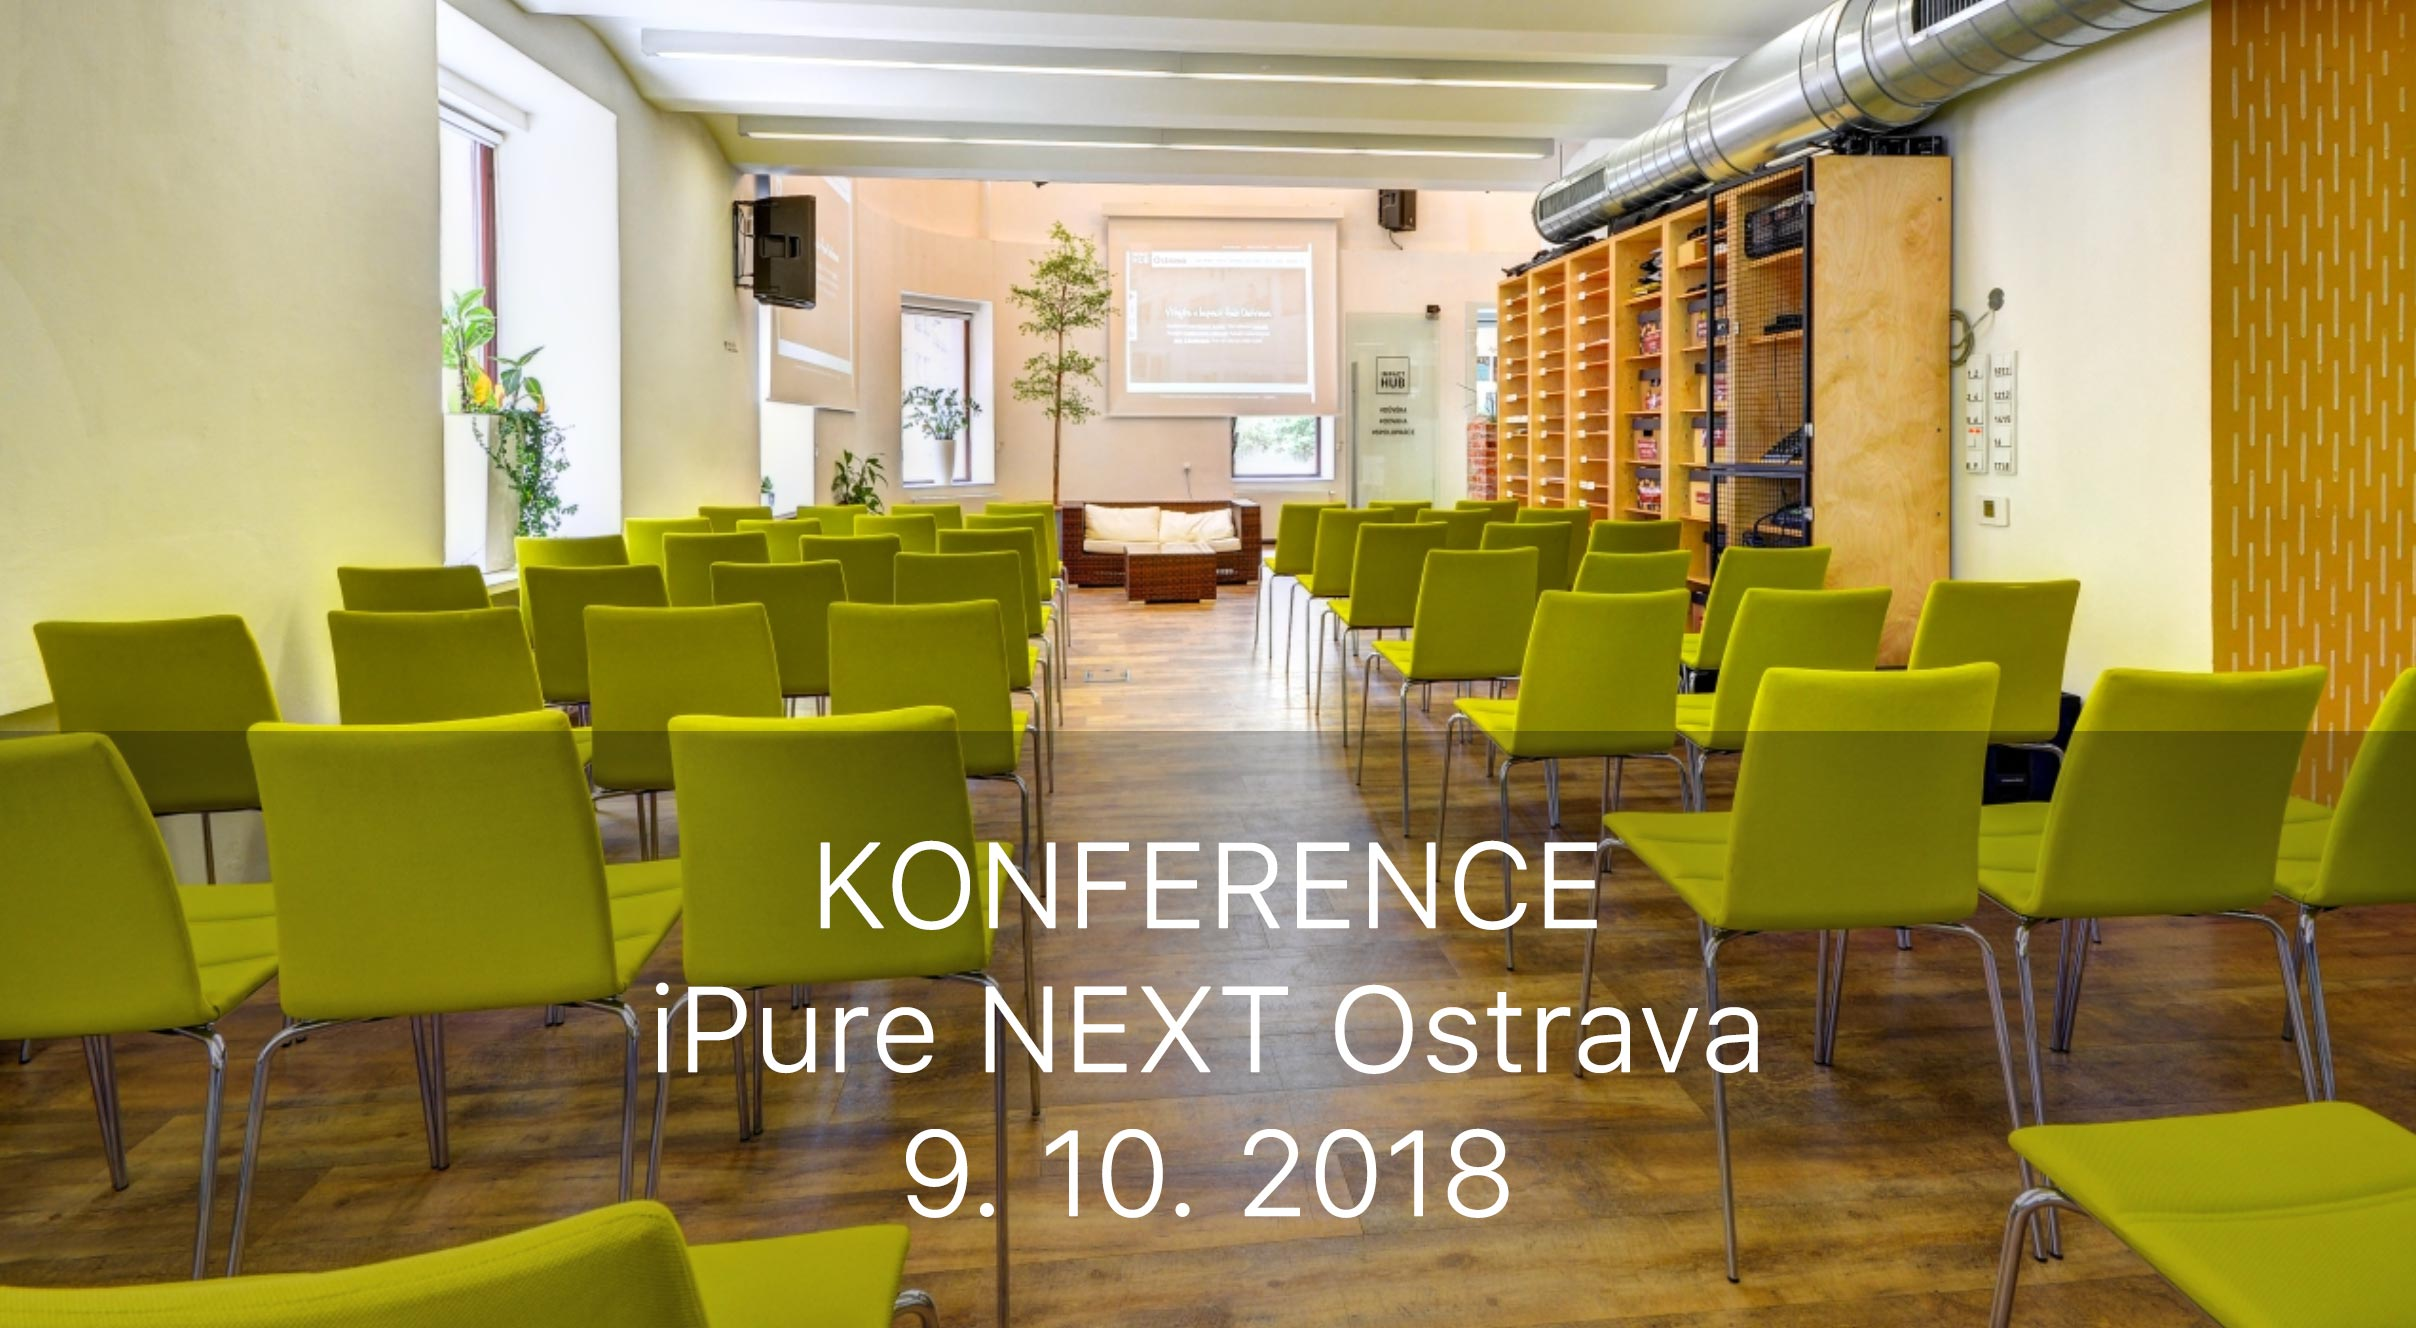 Konference iPure NEXT Ostrava